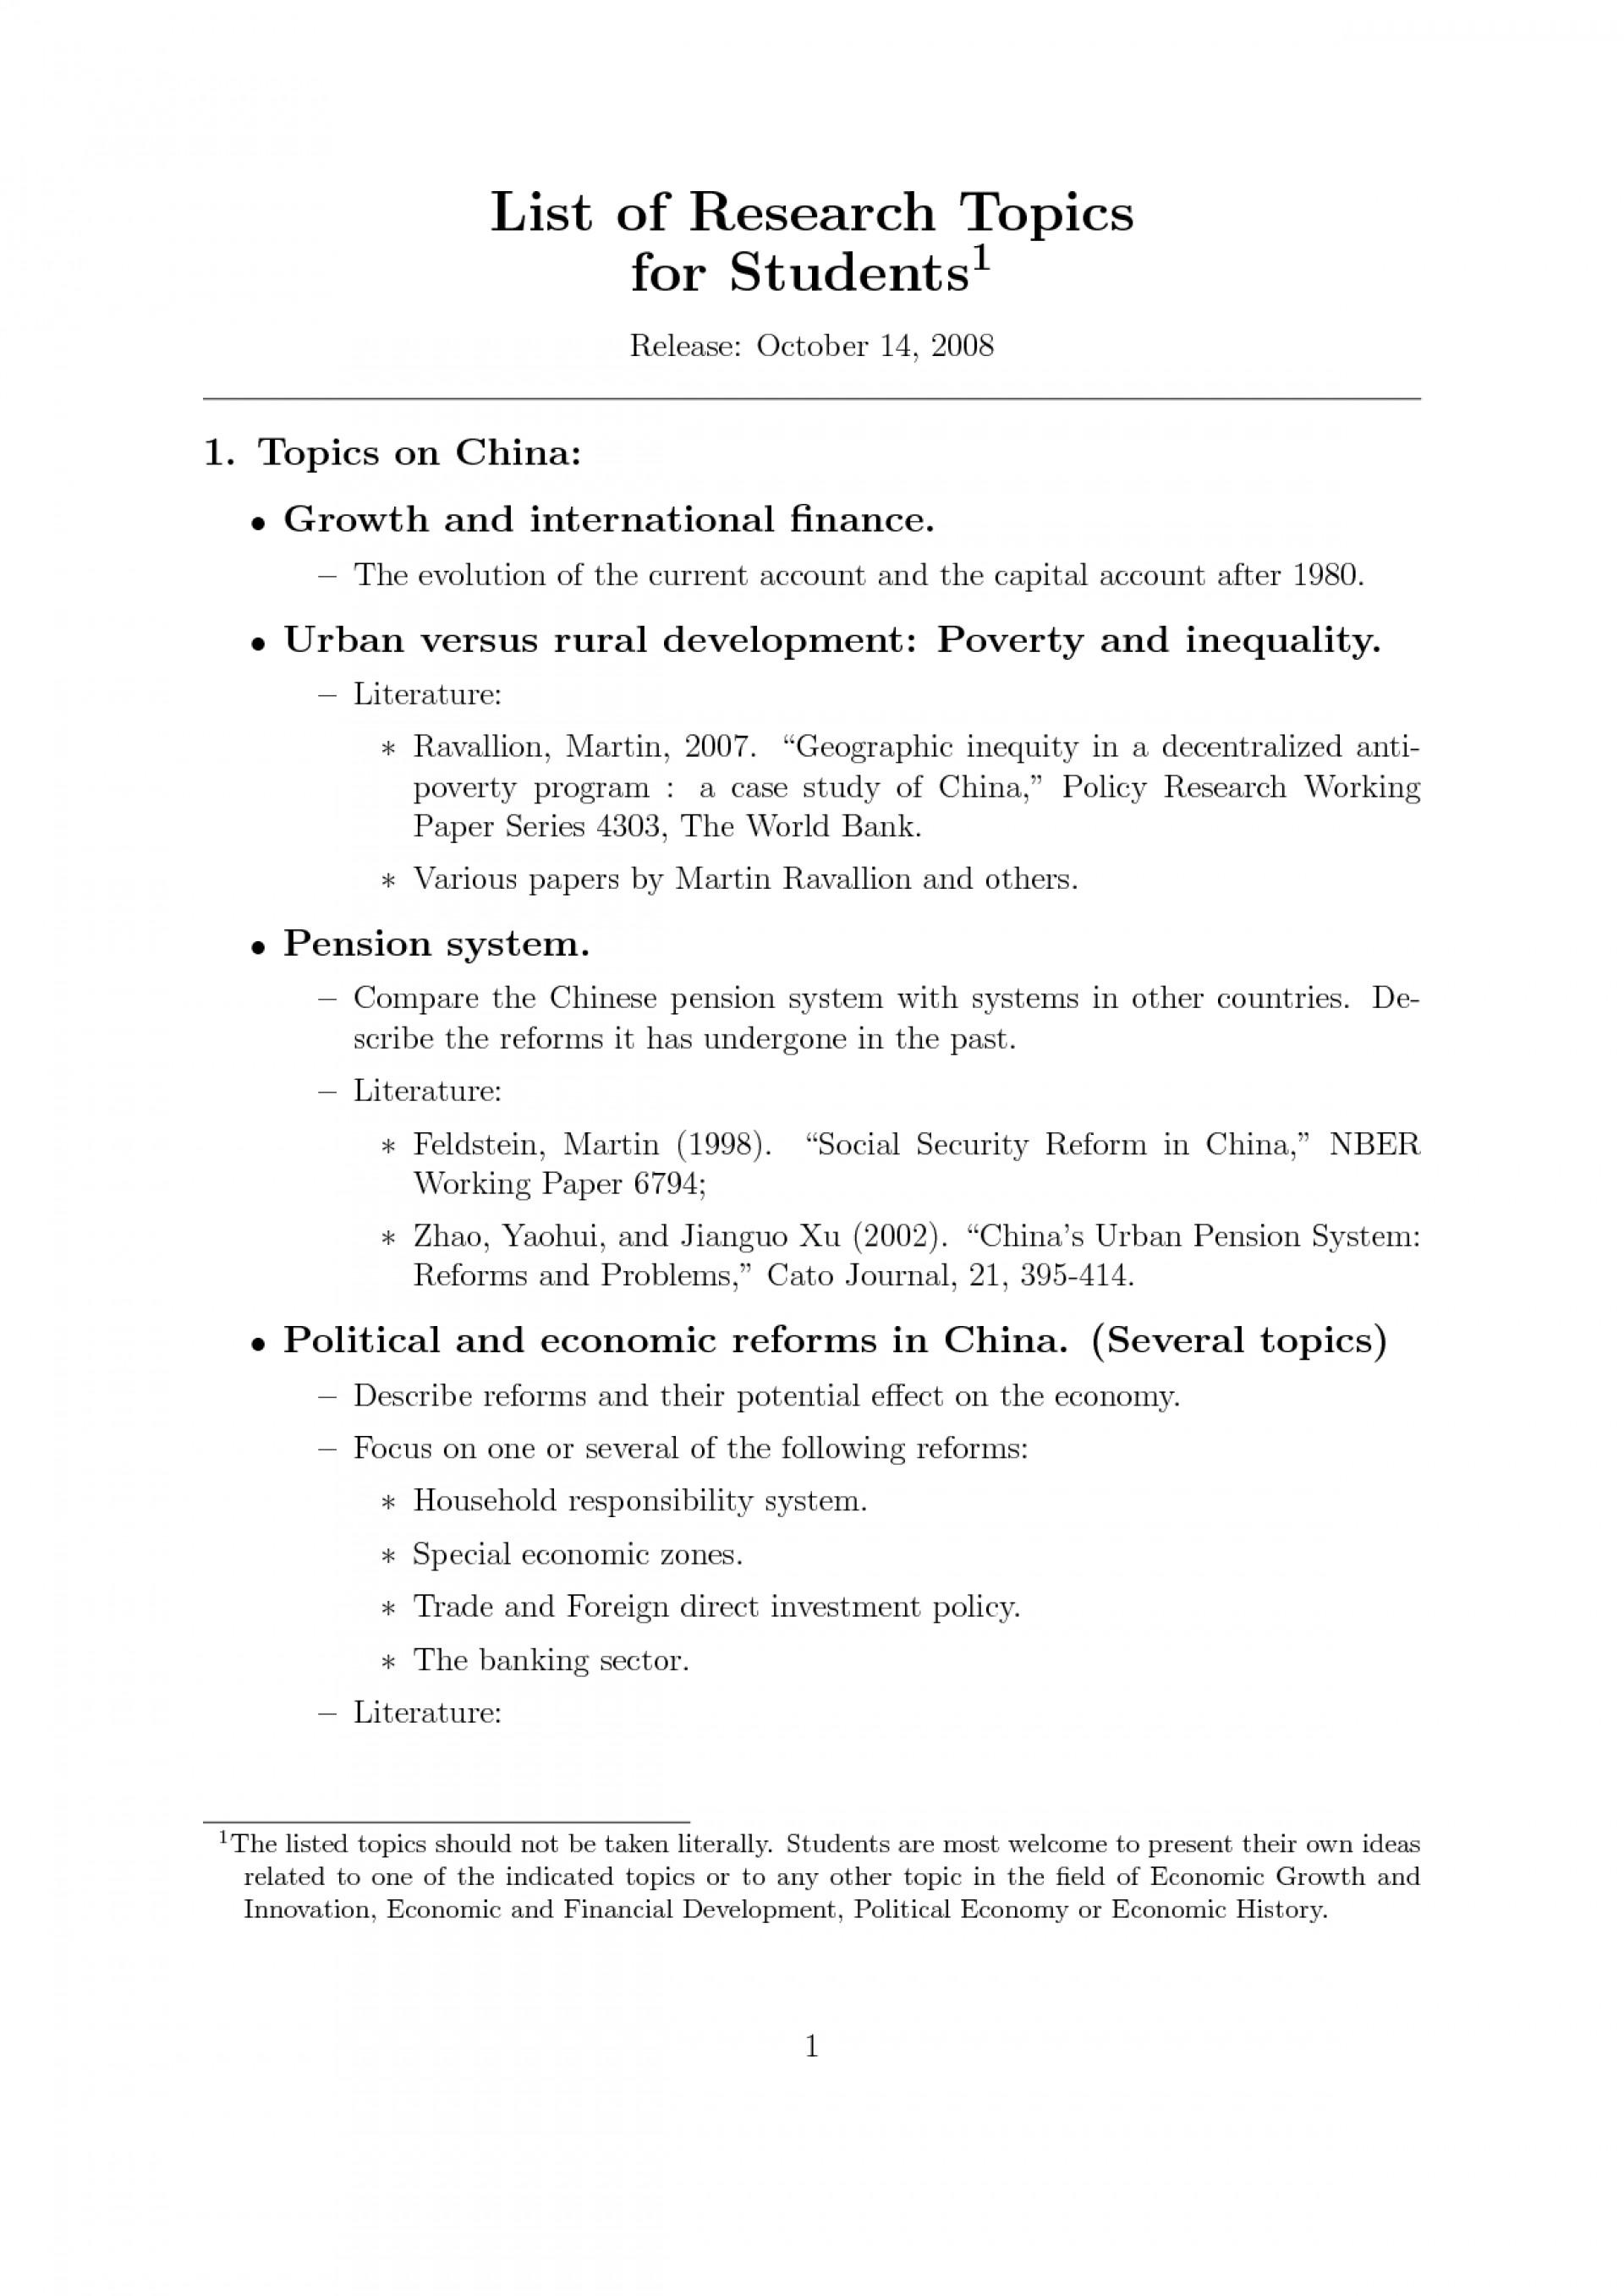 006 Political Essay Topics 38wyqtq0em Stirring Party Questions Science Argumentative Geography Paper 1920